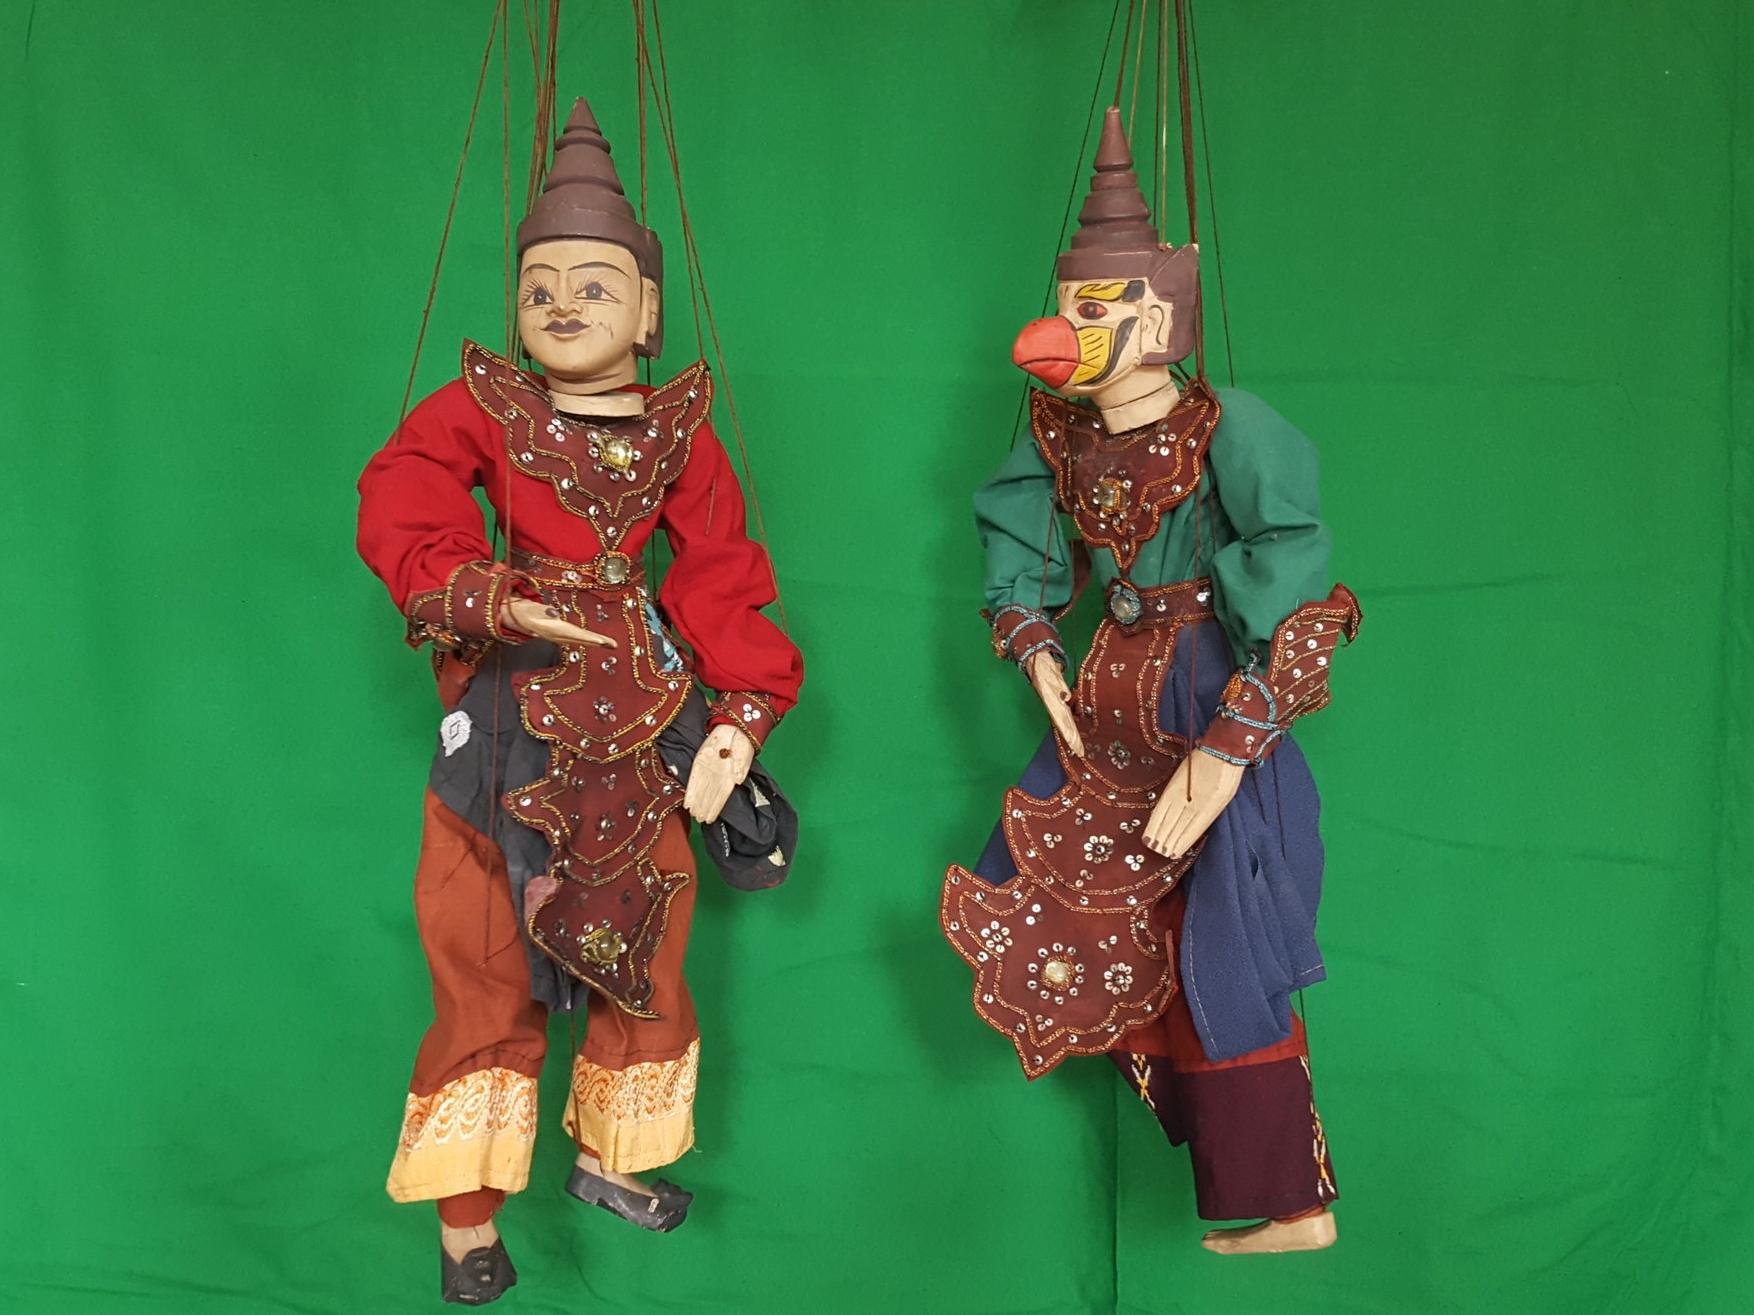 Myanmar-puppets-02-h.jpg